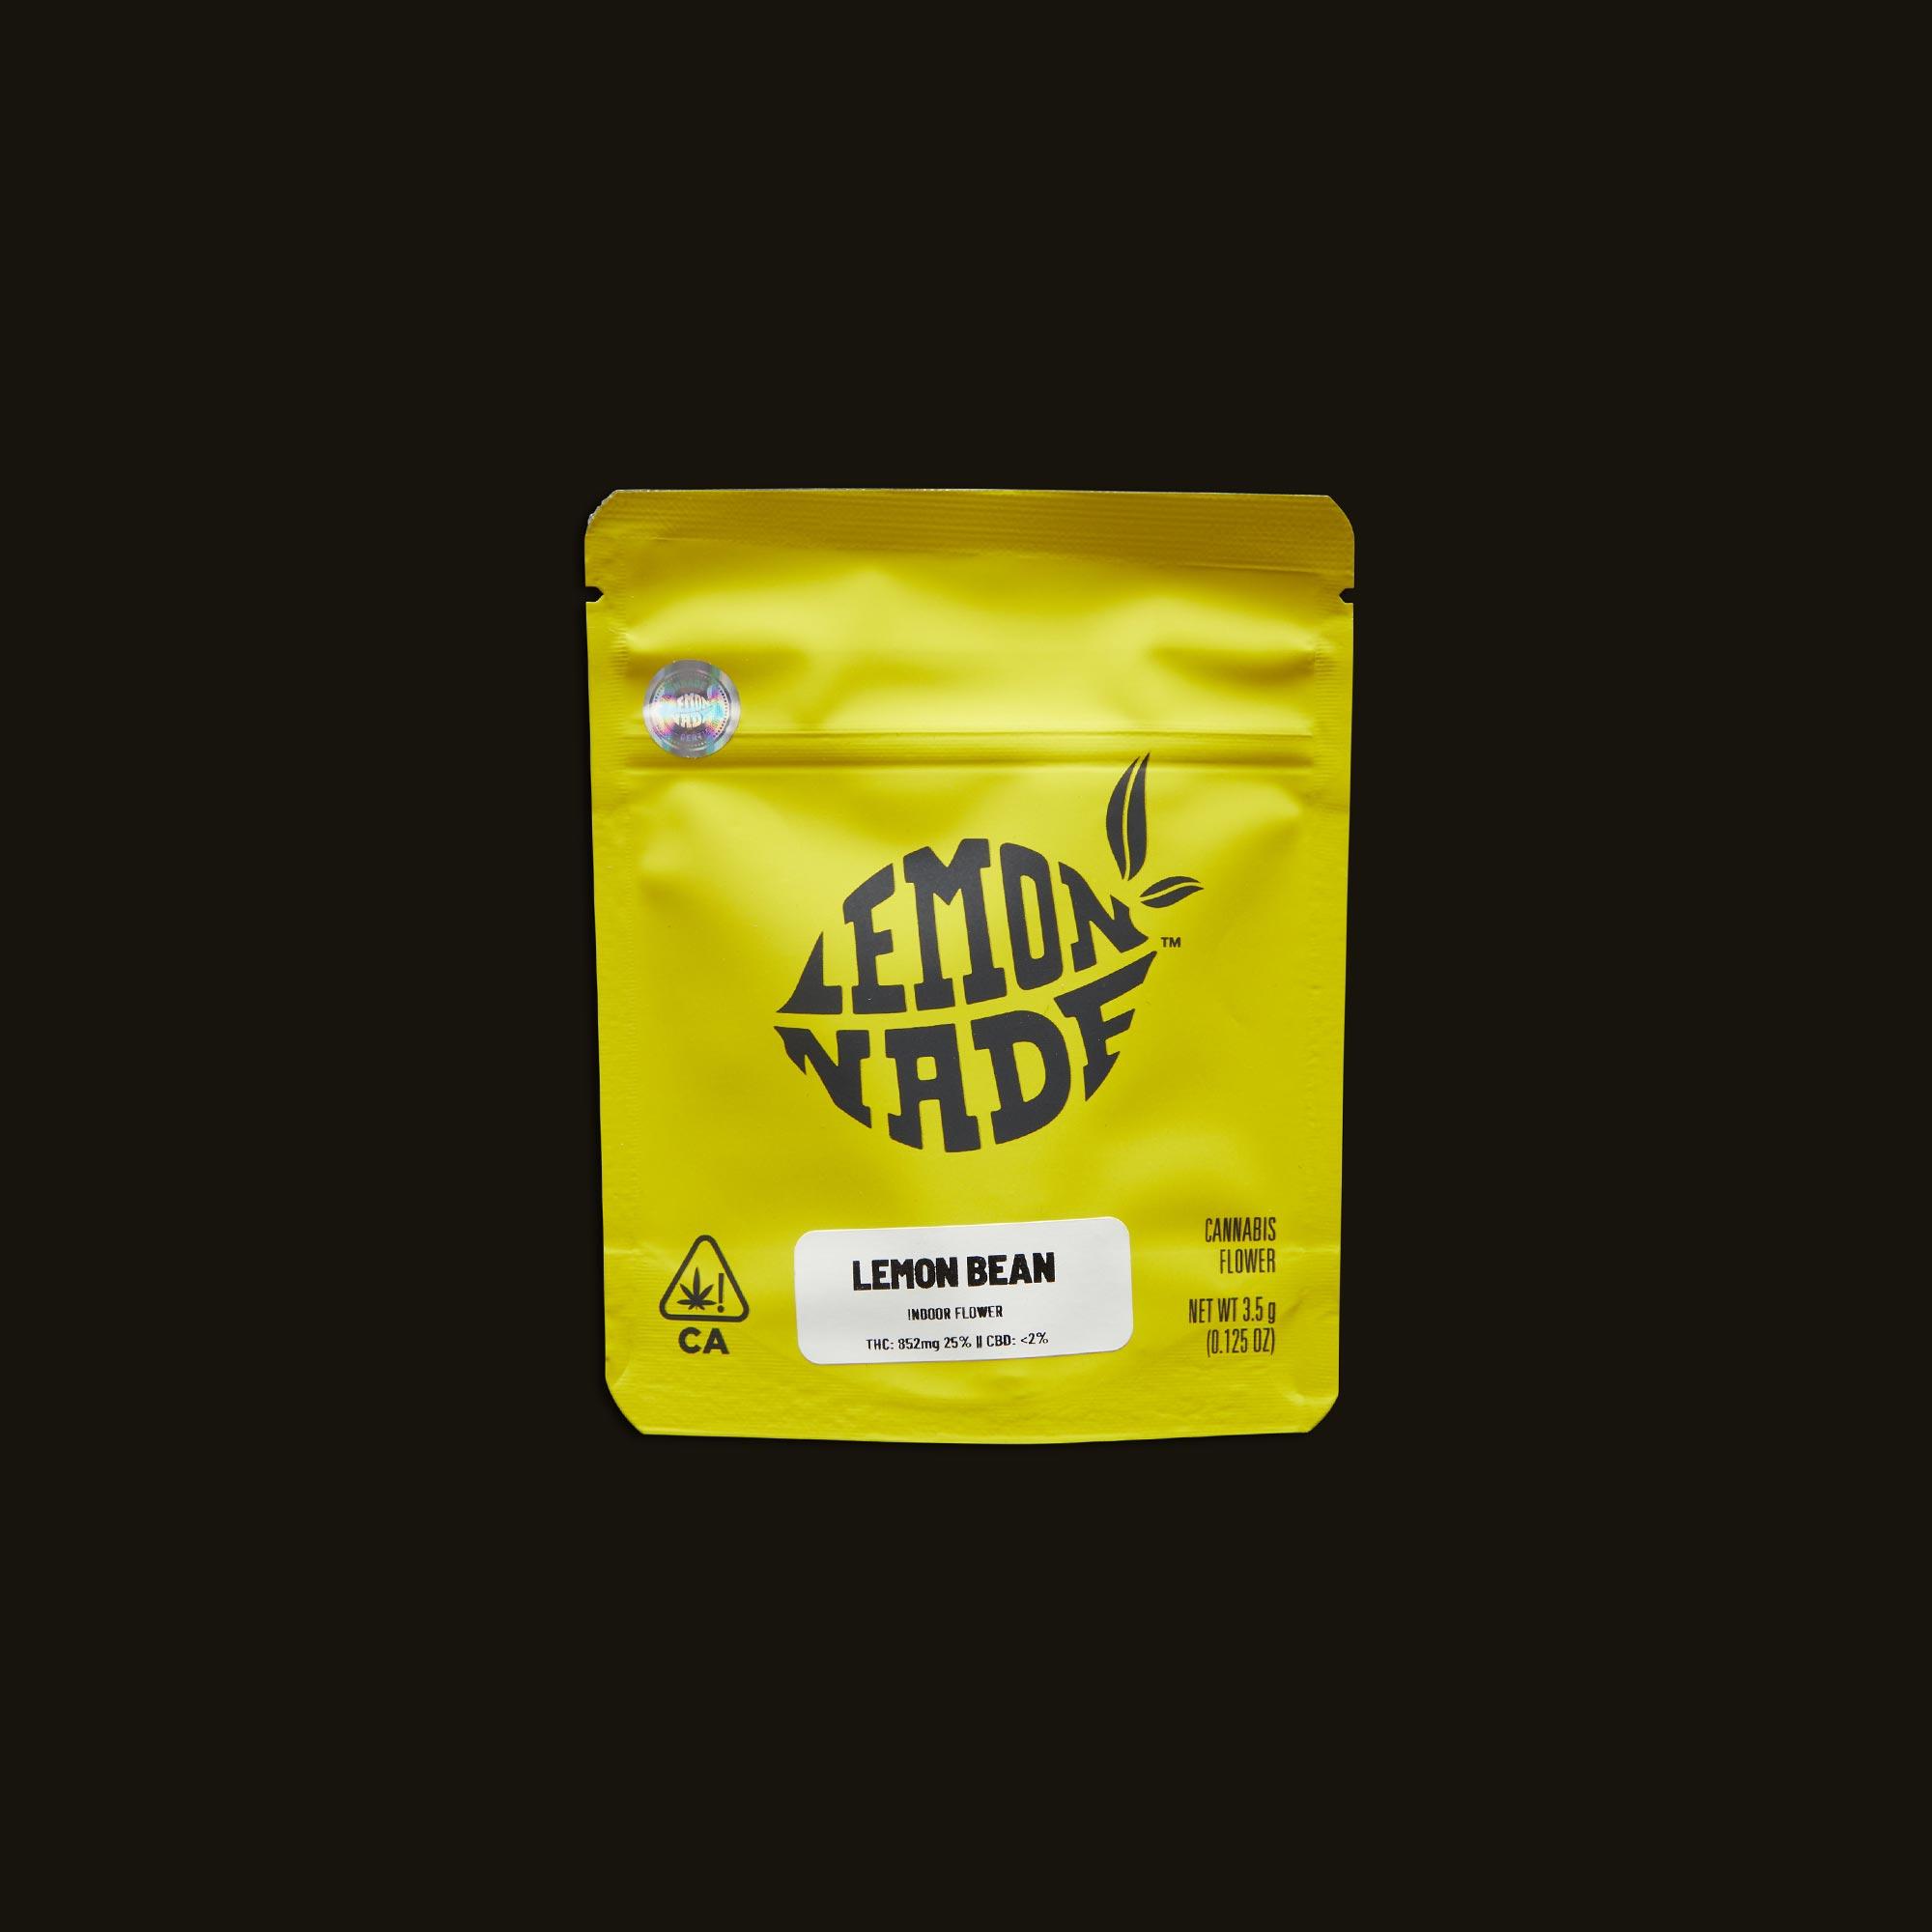 Lemonnade Lemon Bean Front Packaging